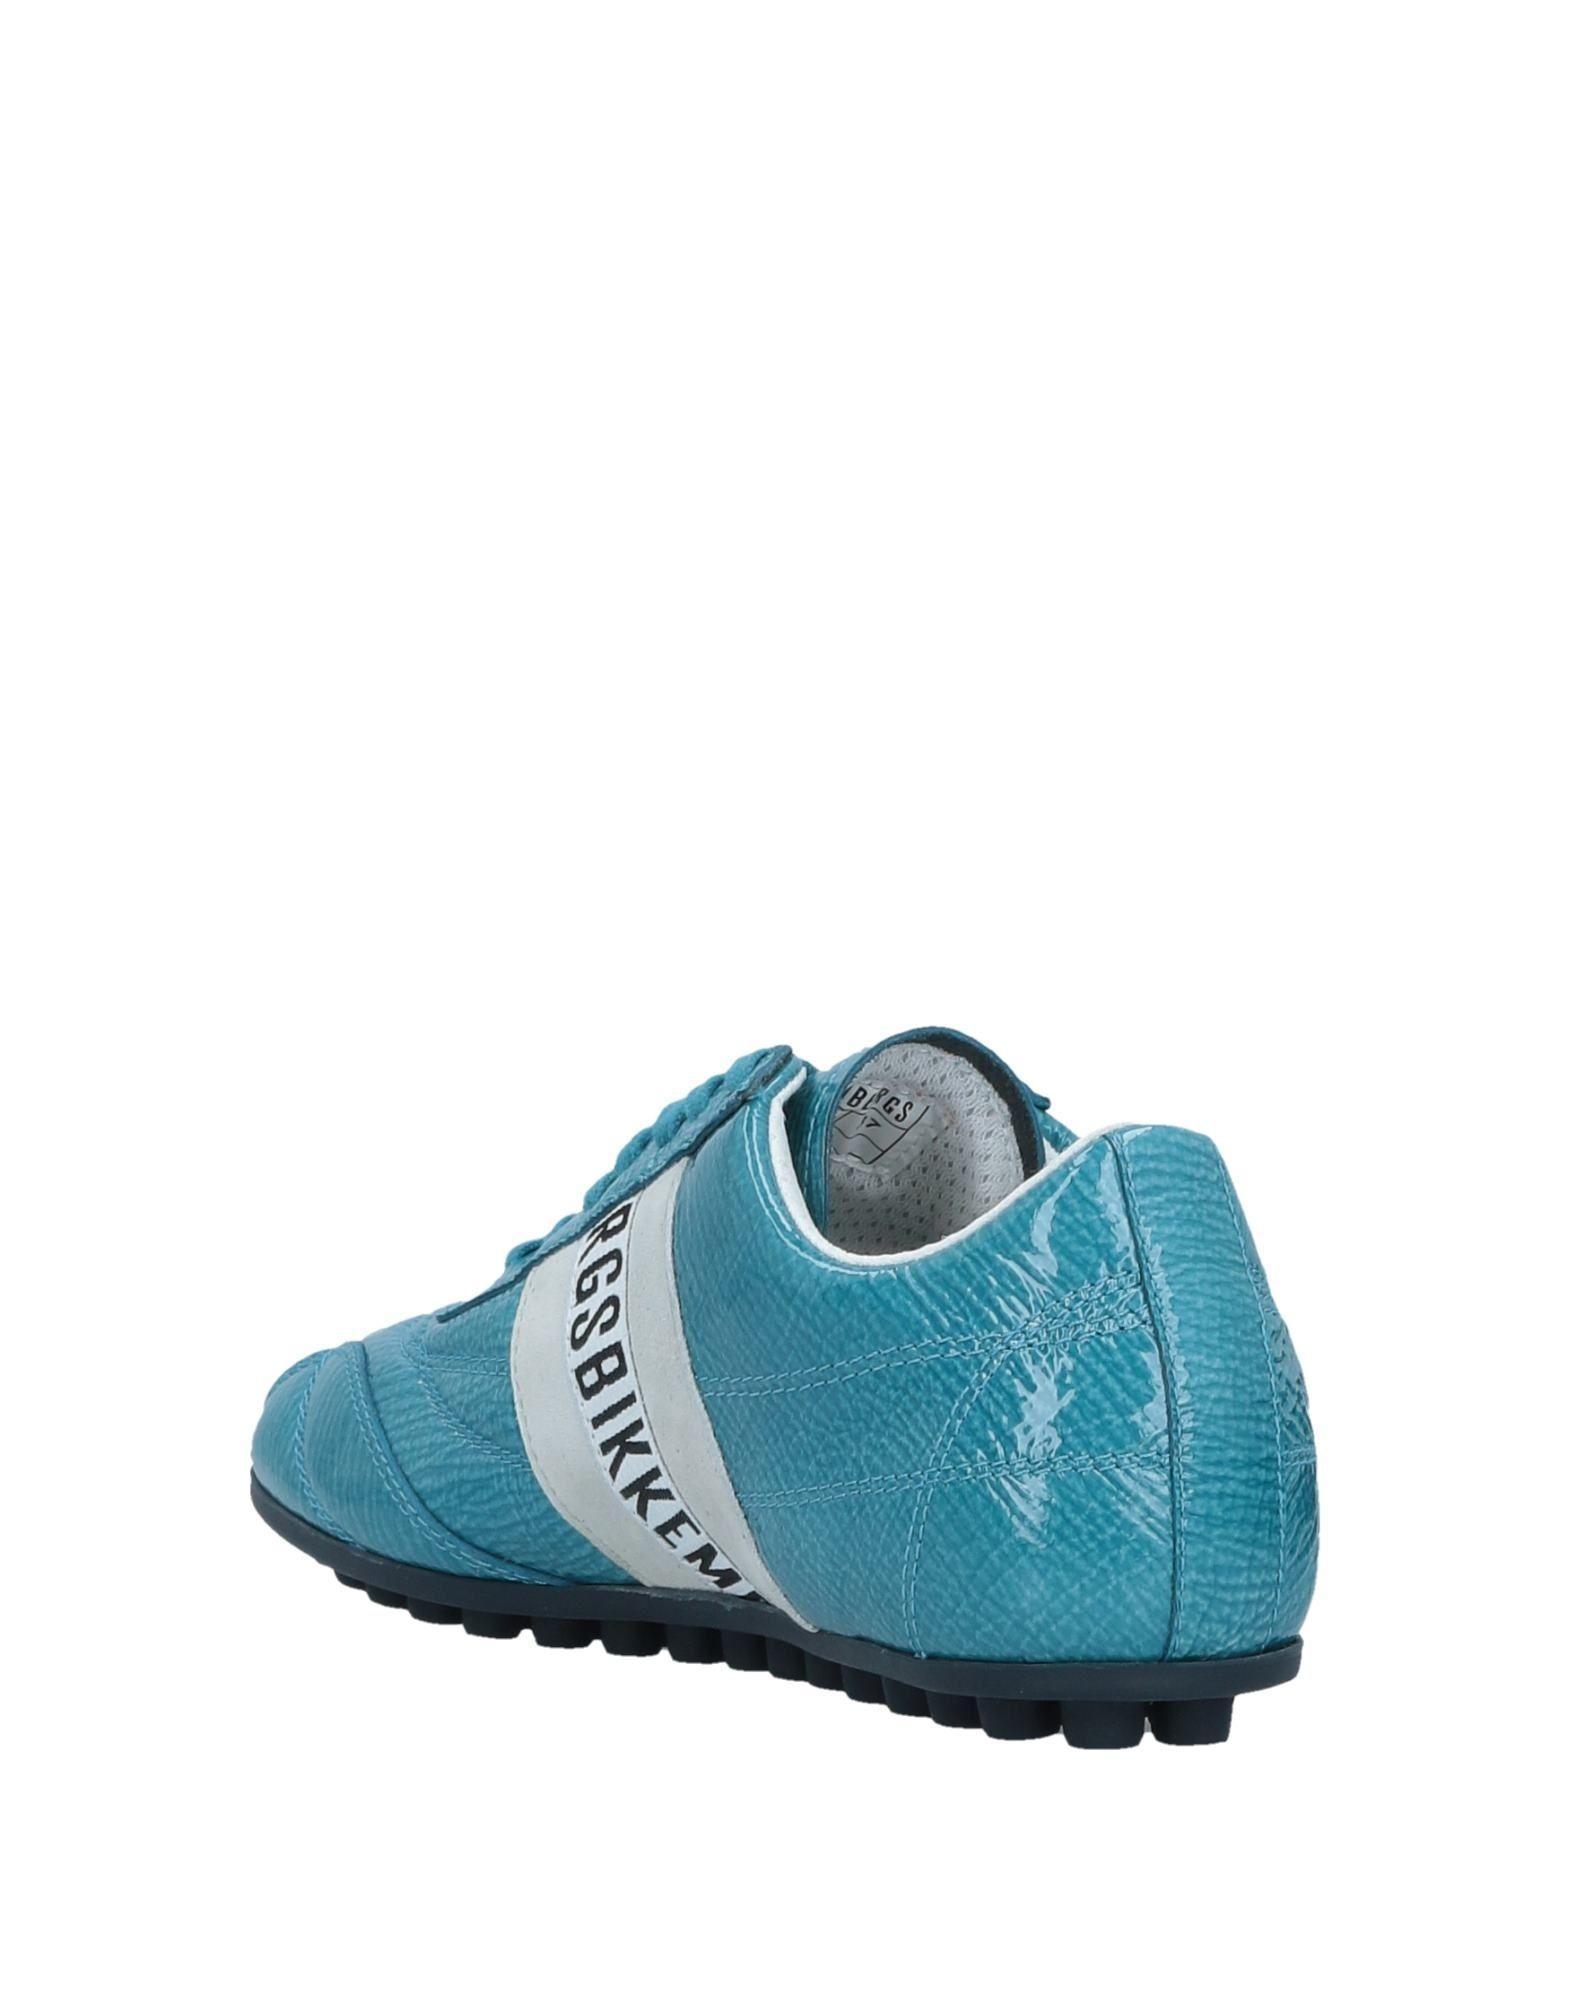 Bikkembergs Sneakers Damen Damen Sneakers  11521855DC 147908